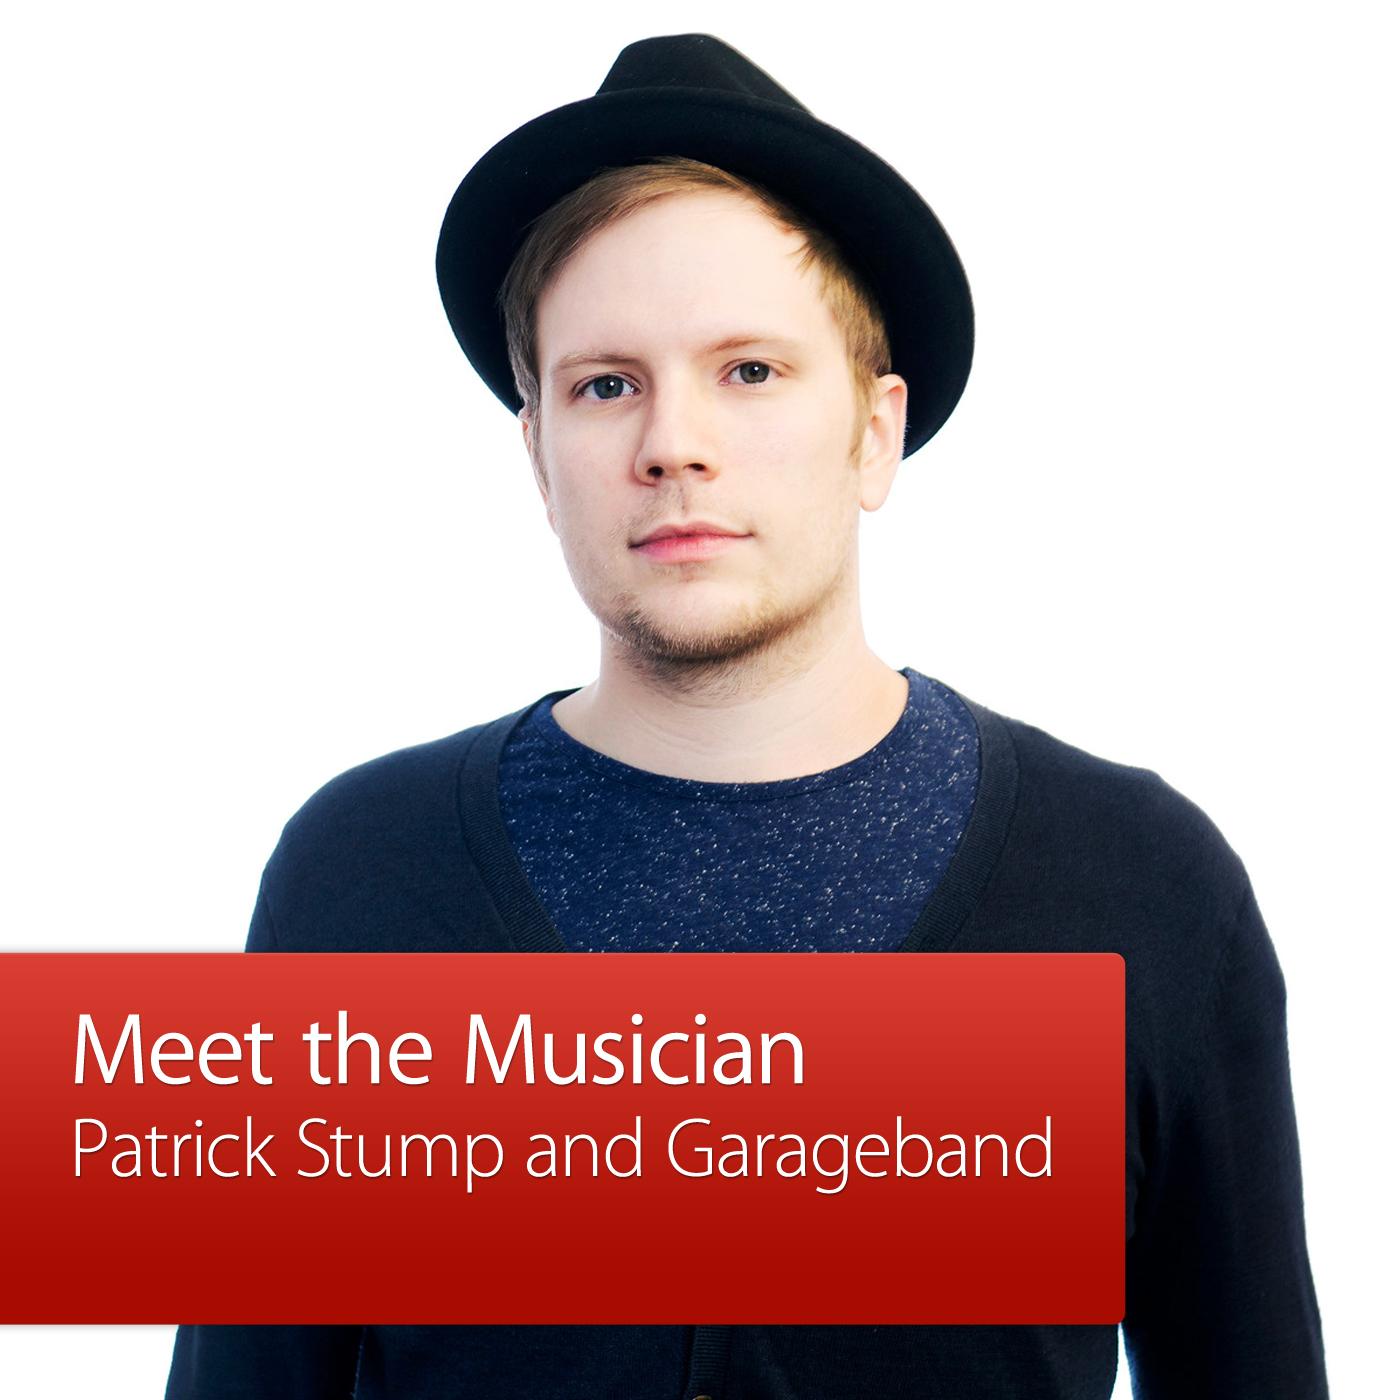 Patrick Stump and GarageBand: Meet the Musician